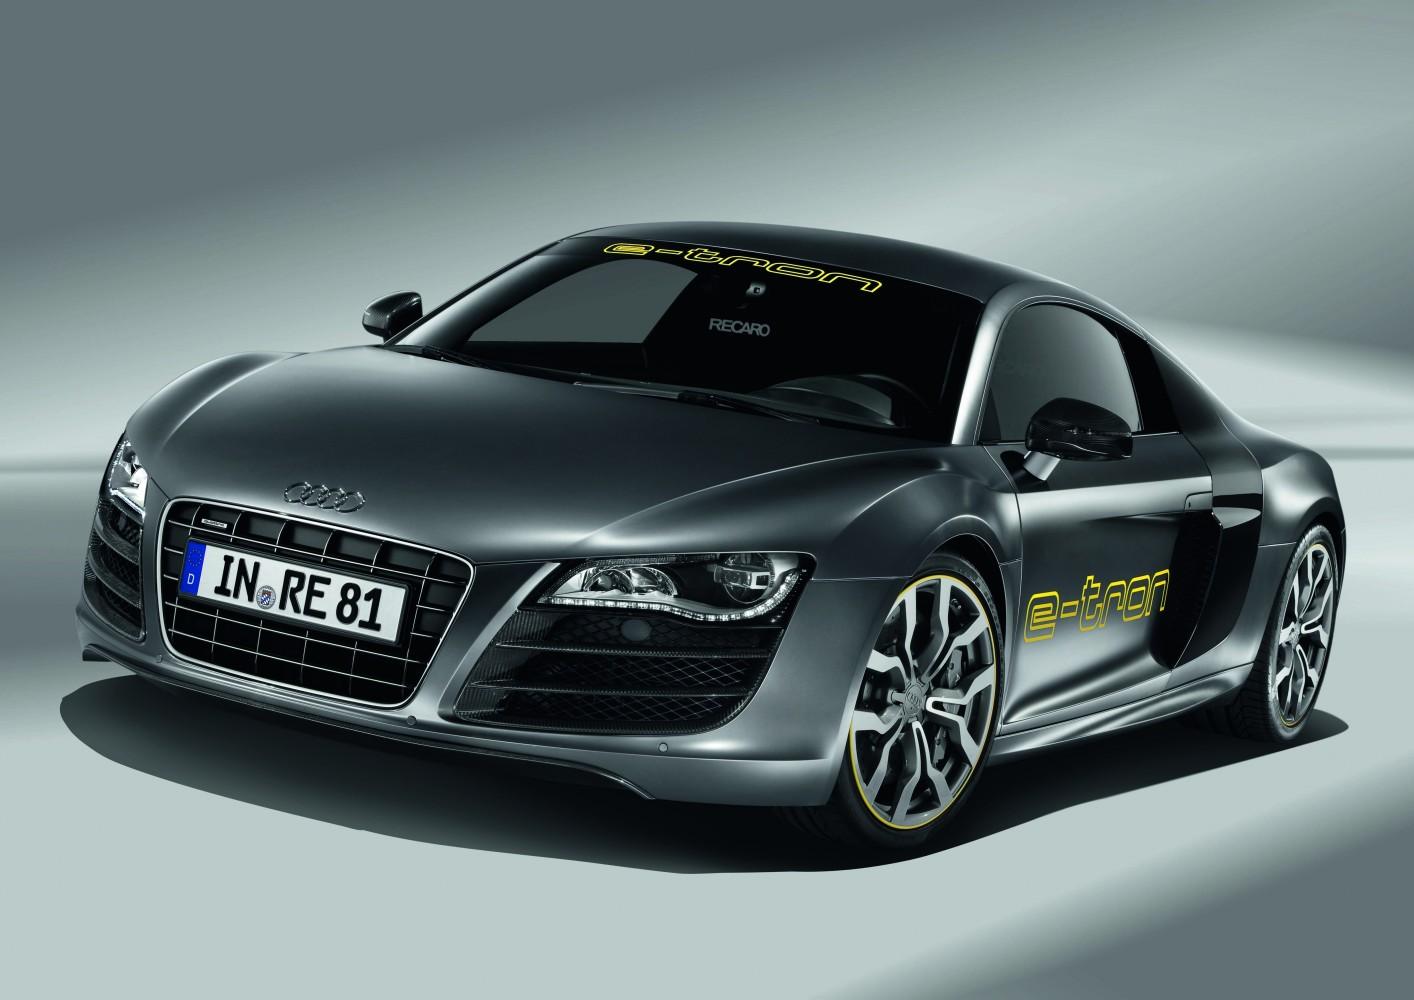 Audi R8 e-tron Testfahrt auf dem Nürburgring [Video]